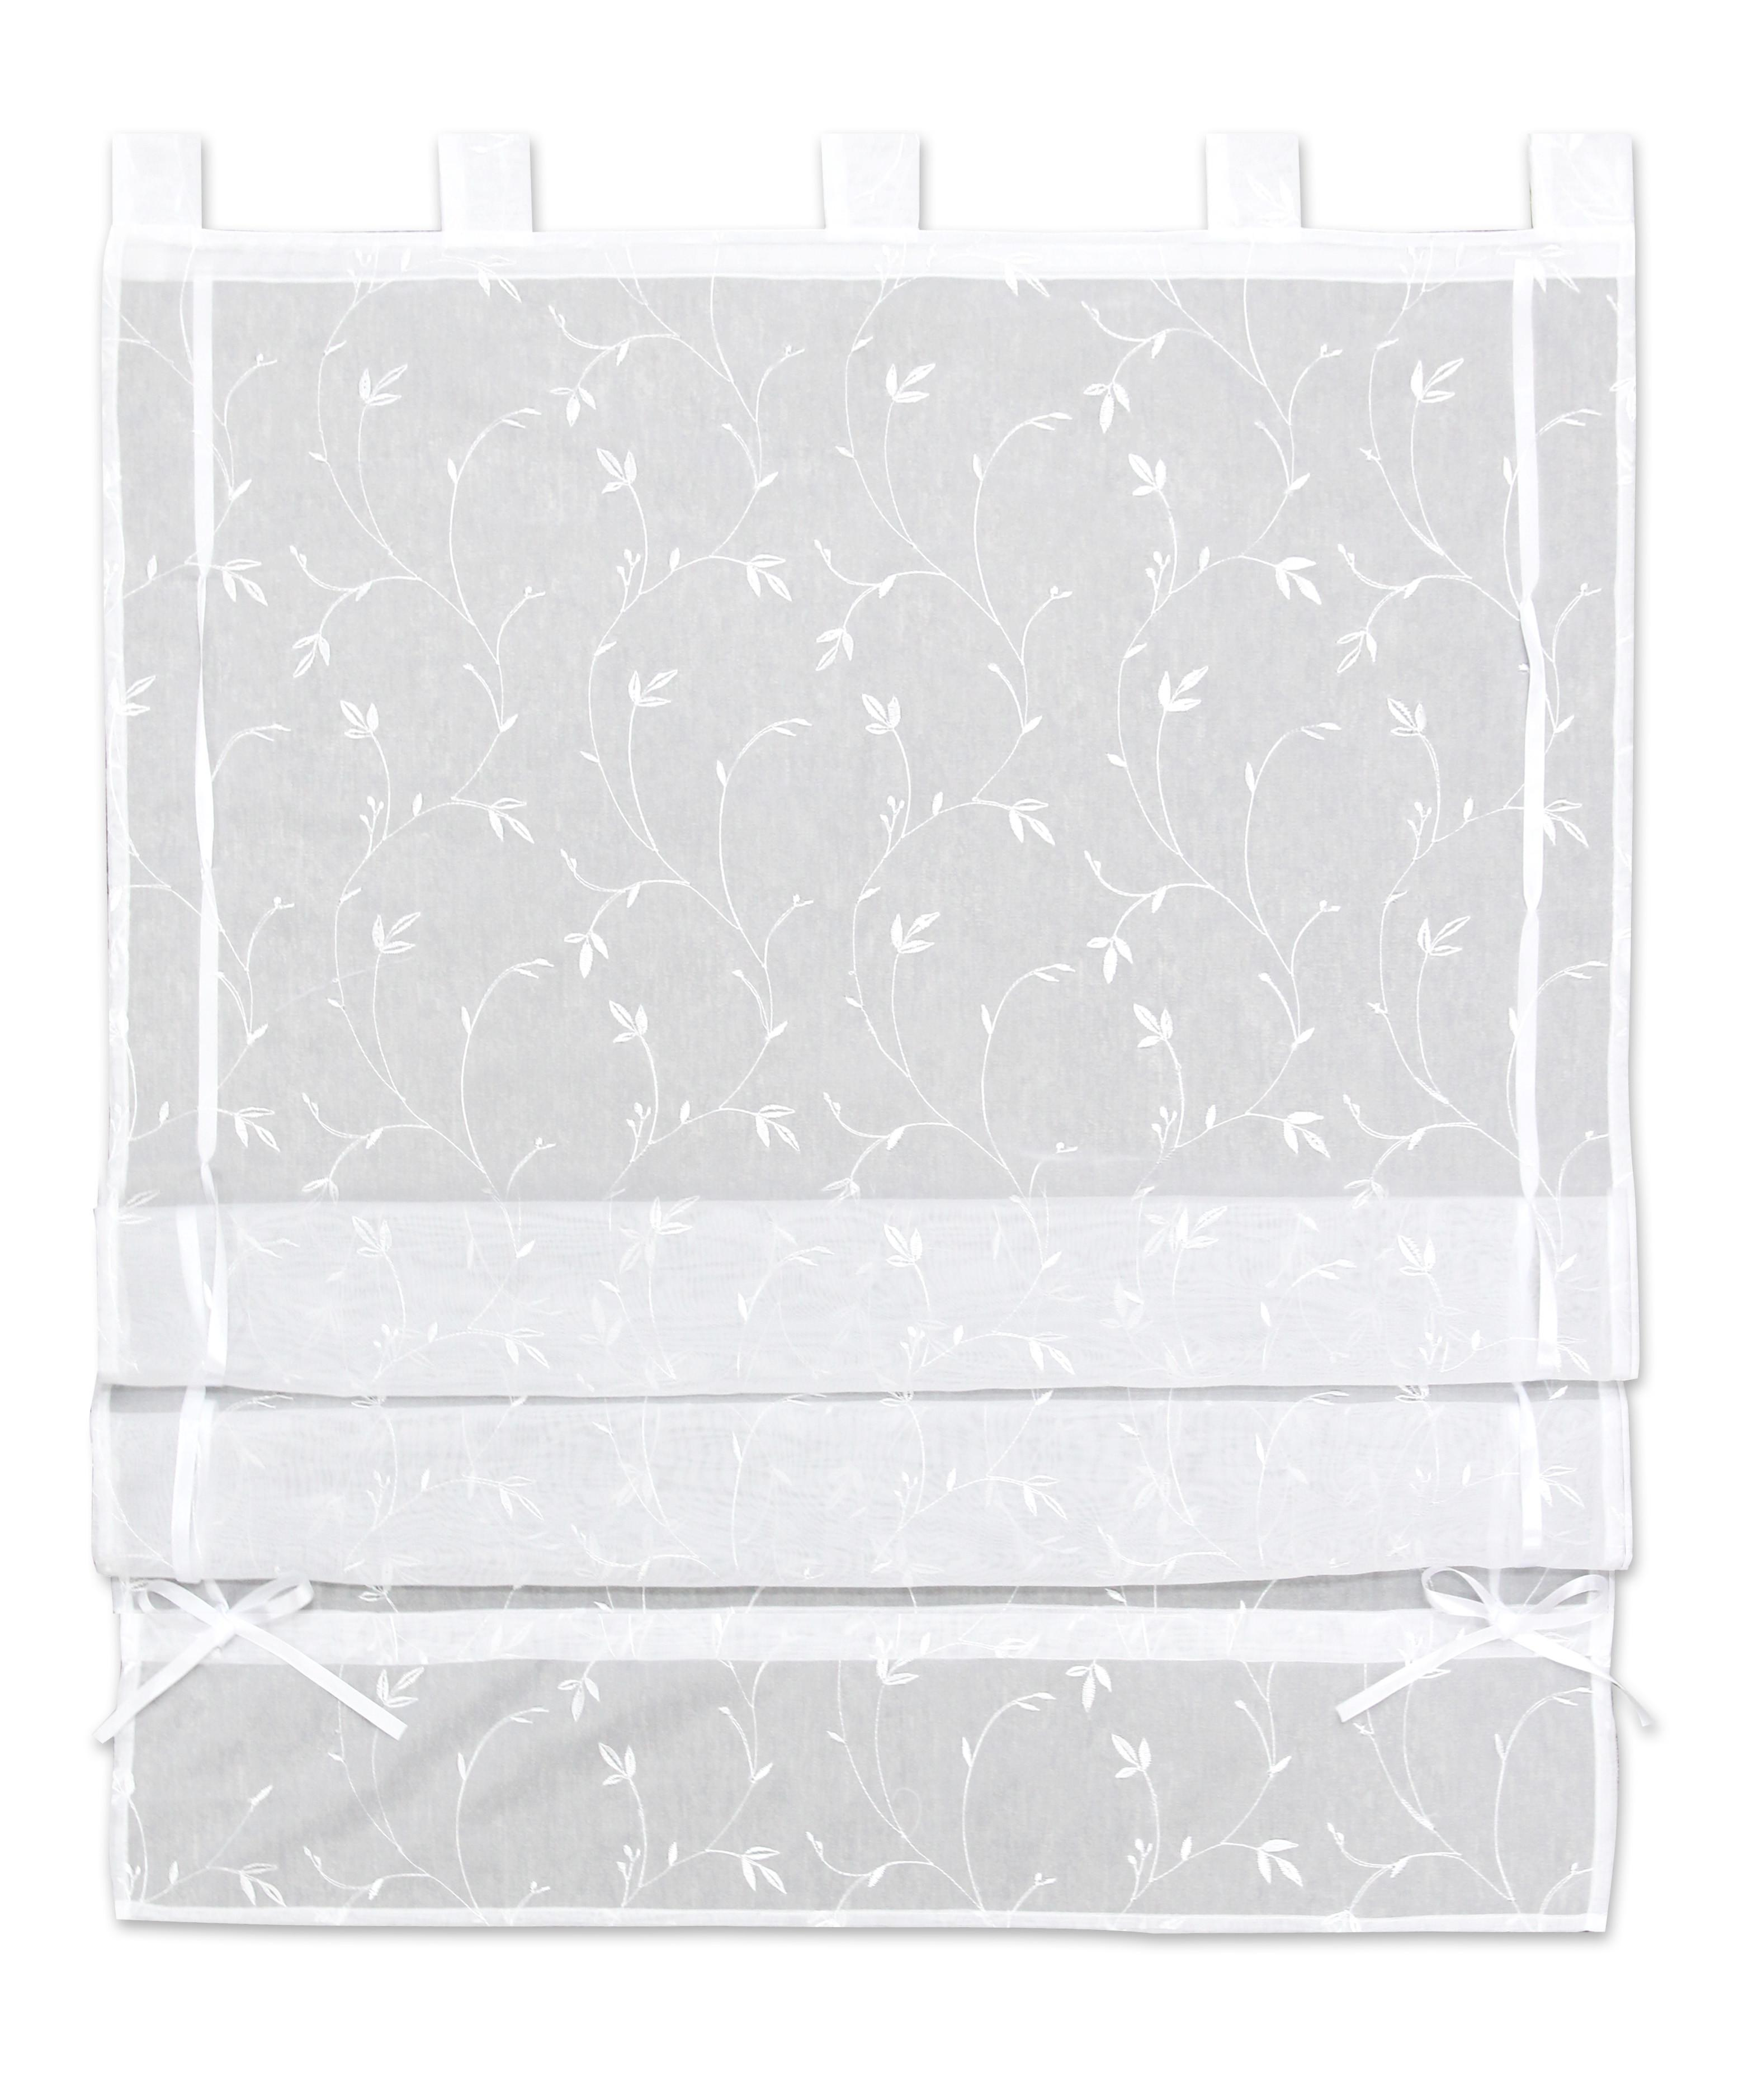 Bändchenrollo Romantic, ca. 80x140cm - Weiß, ROMANTIK / LANDHAUS, Textil (80/140cm) - MÖMAX modern living